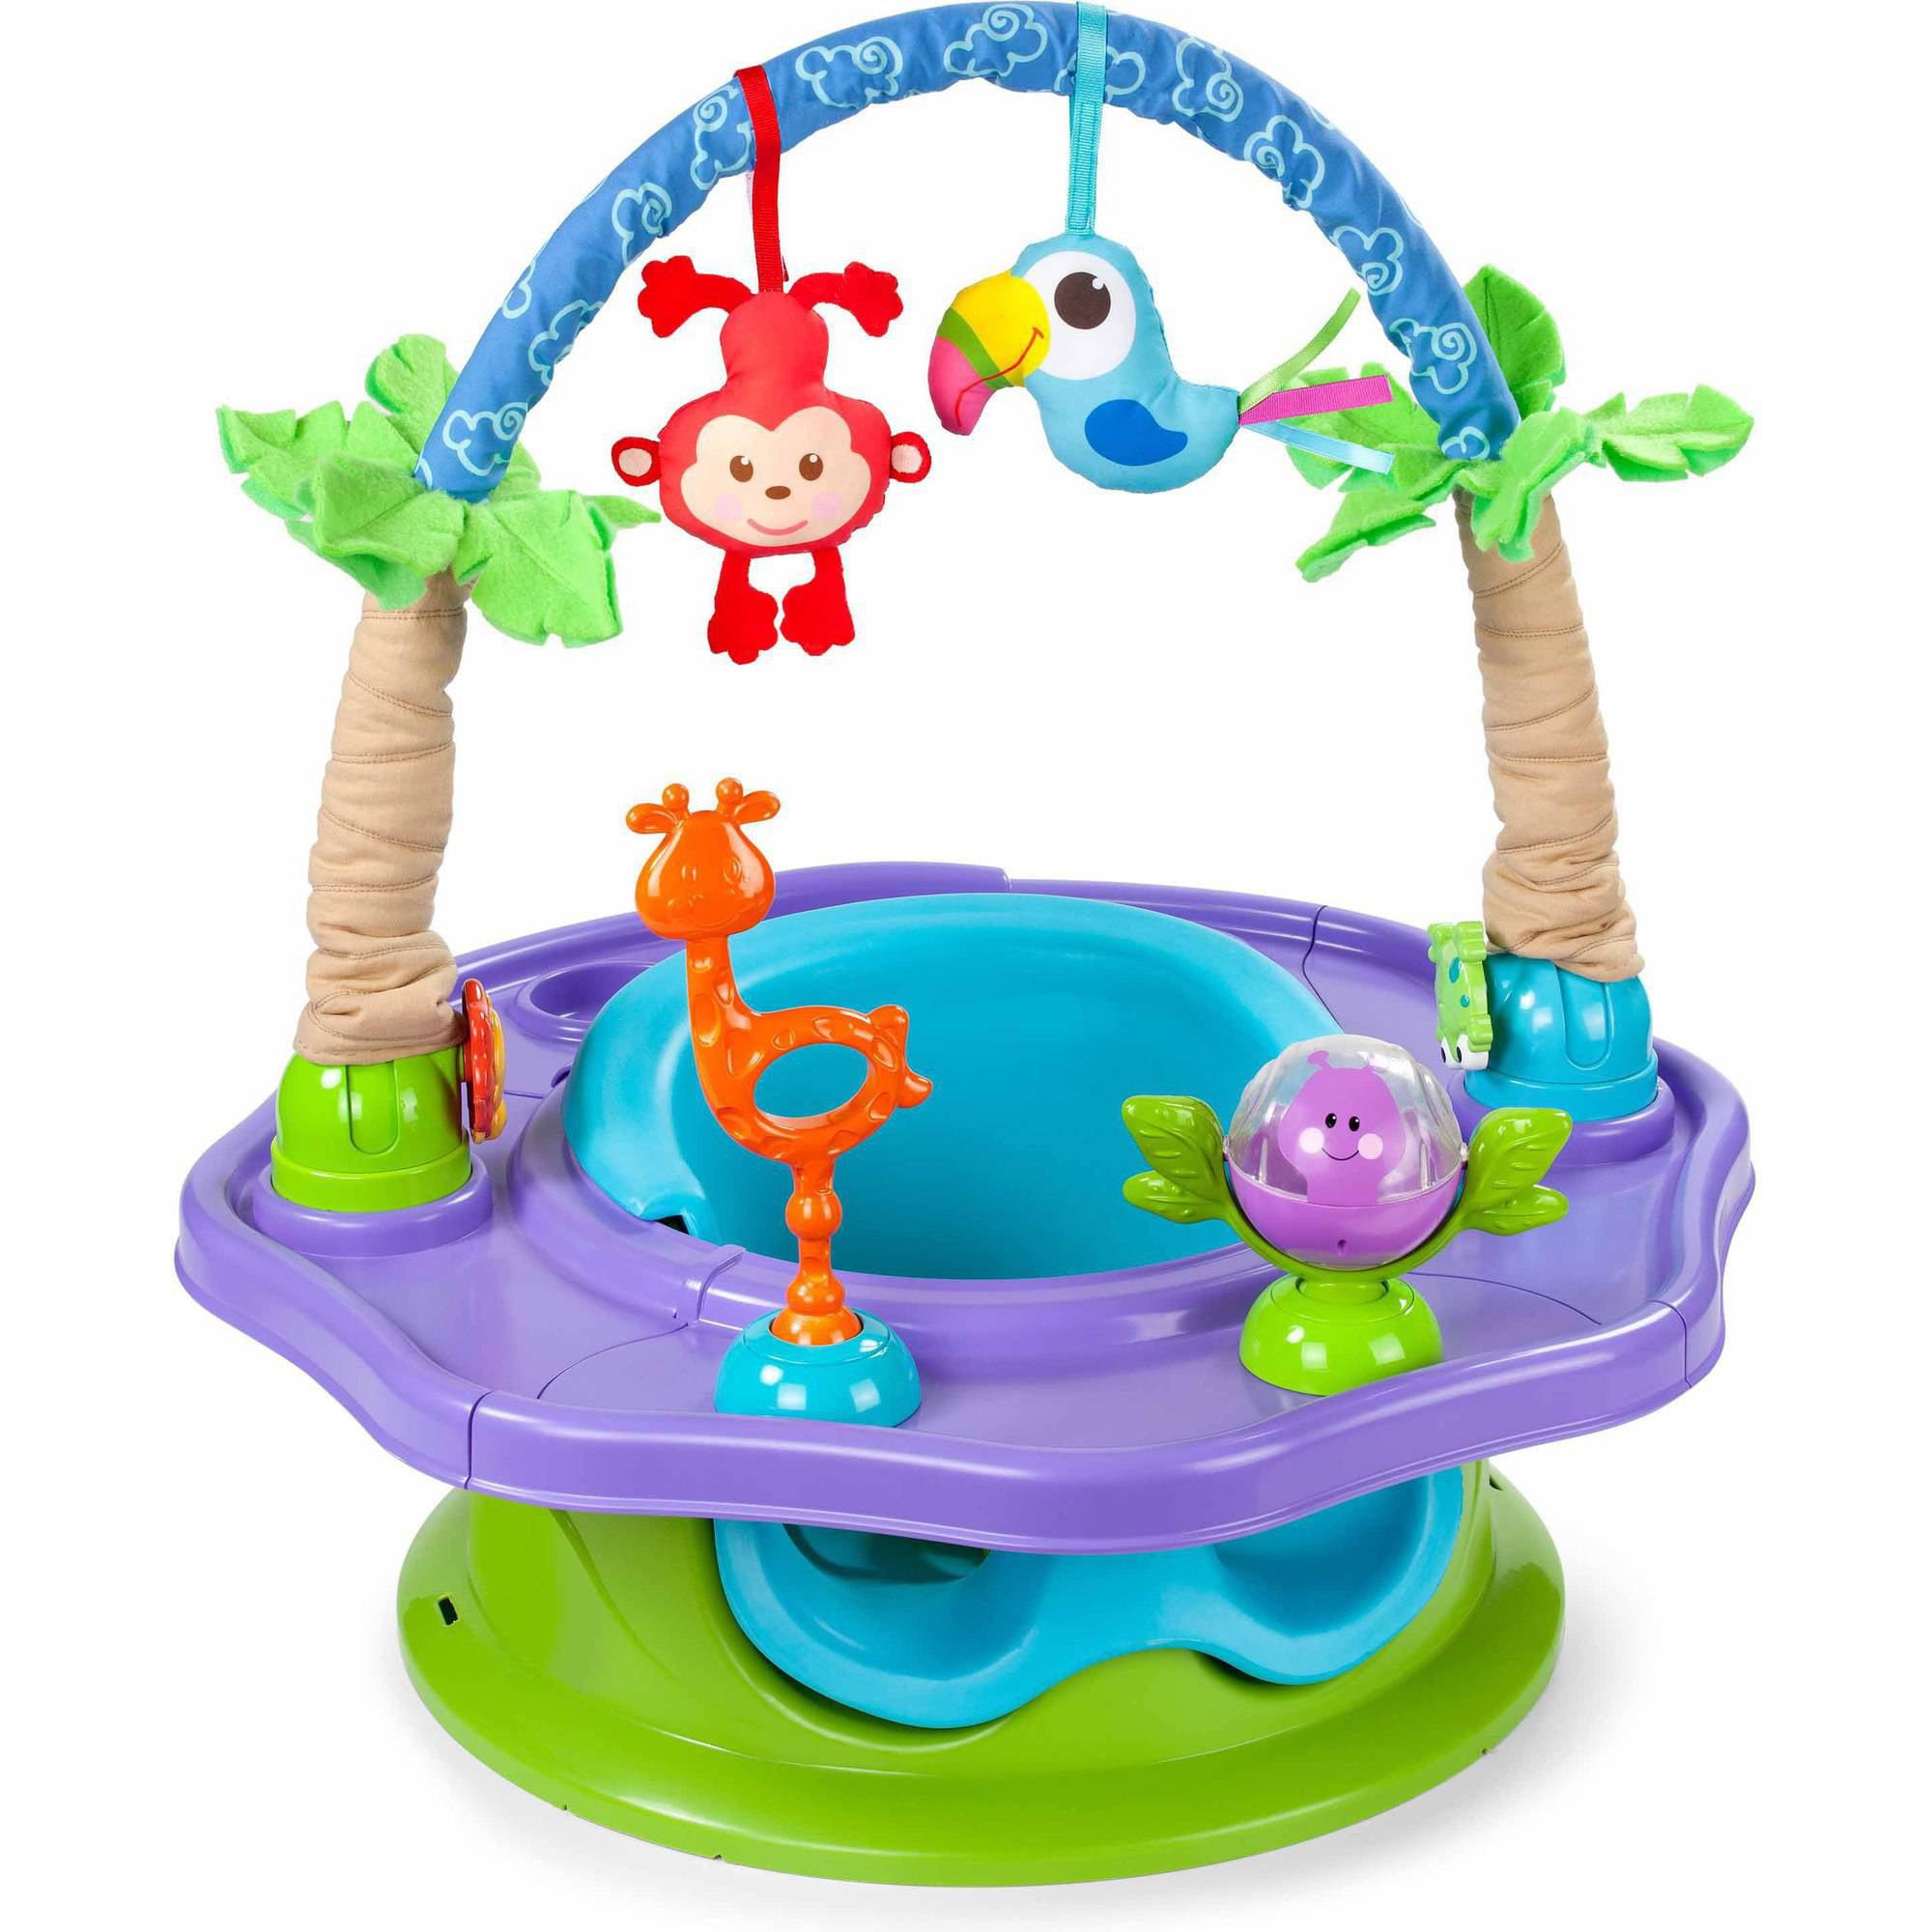 Baby bath chair walmart - Baby Bath Chair Walmart 23